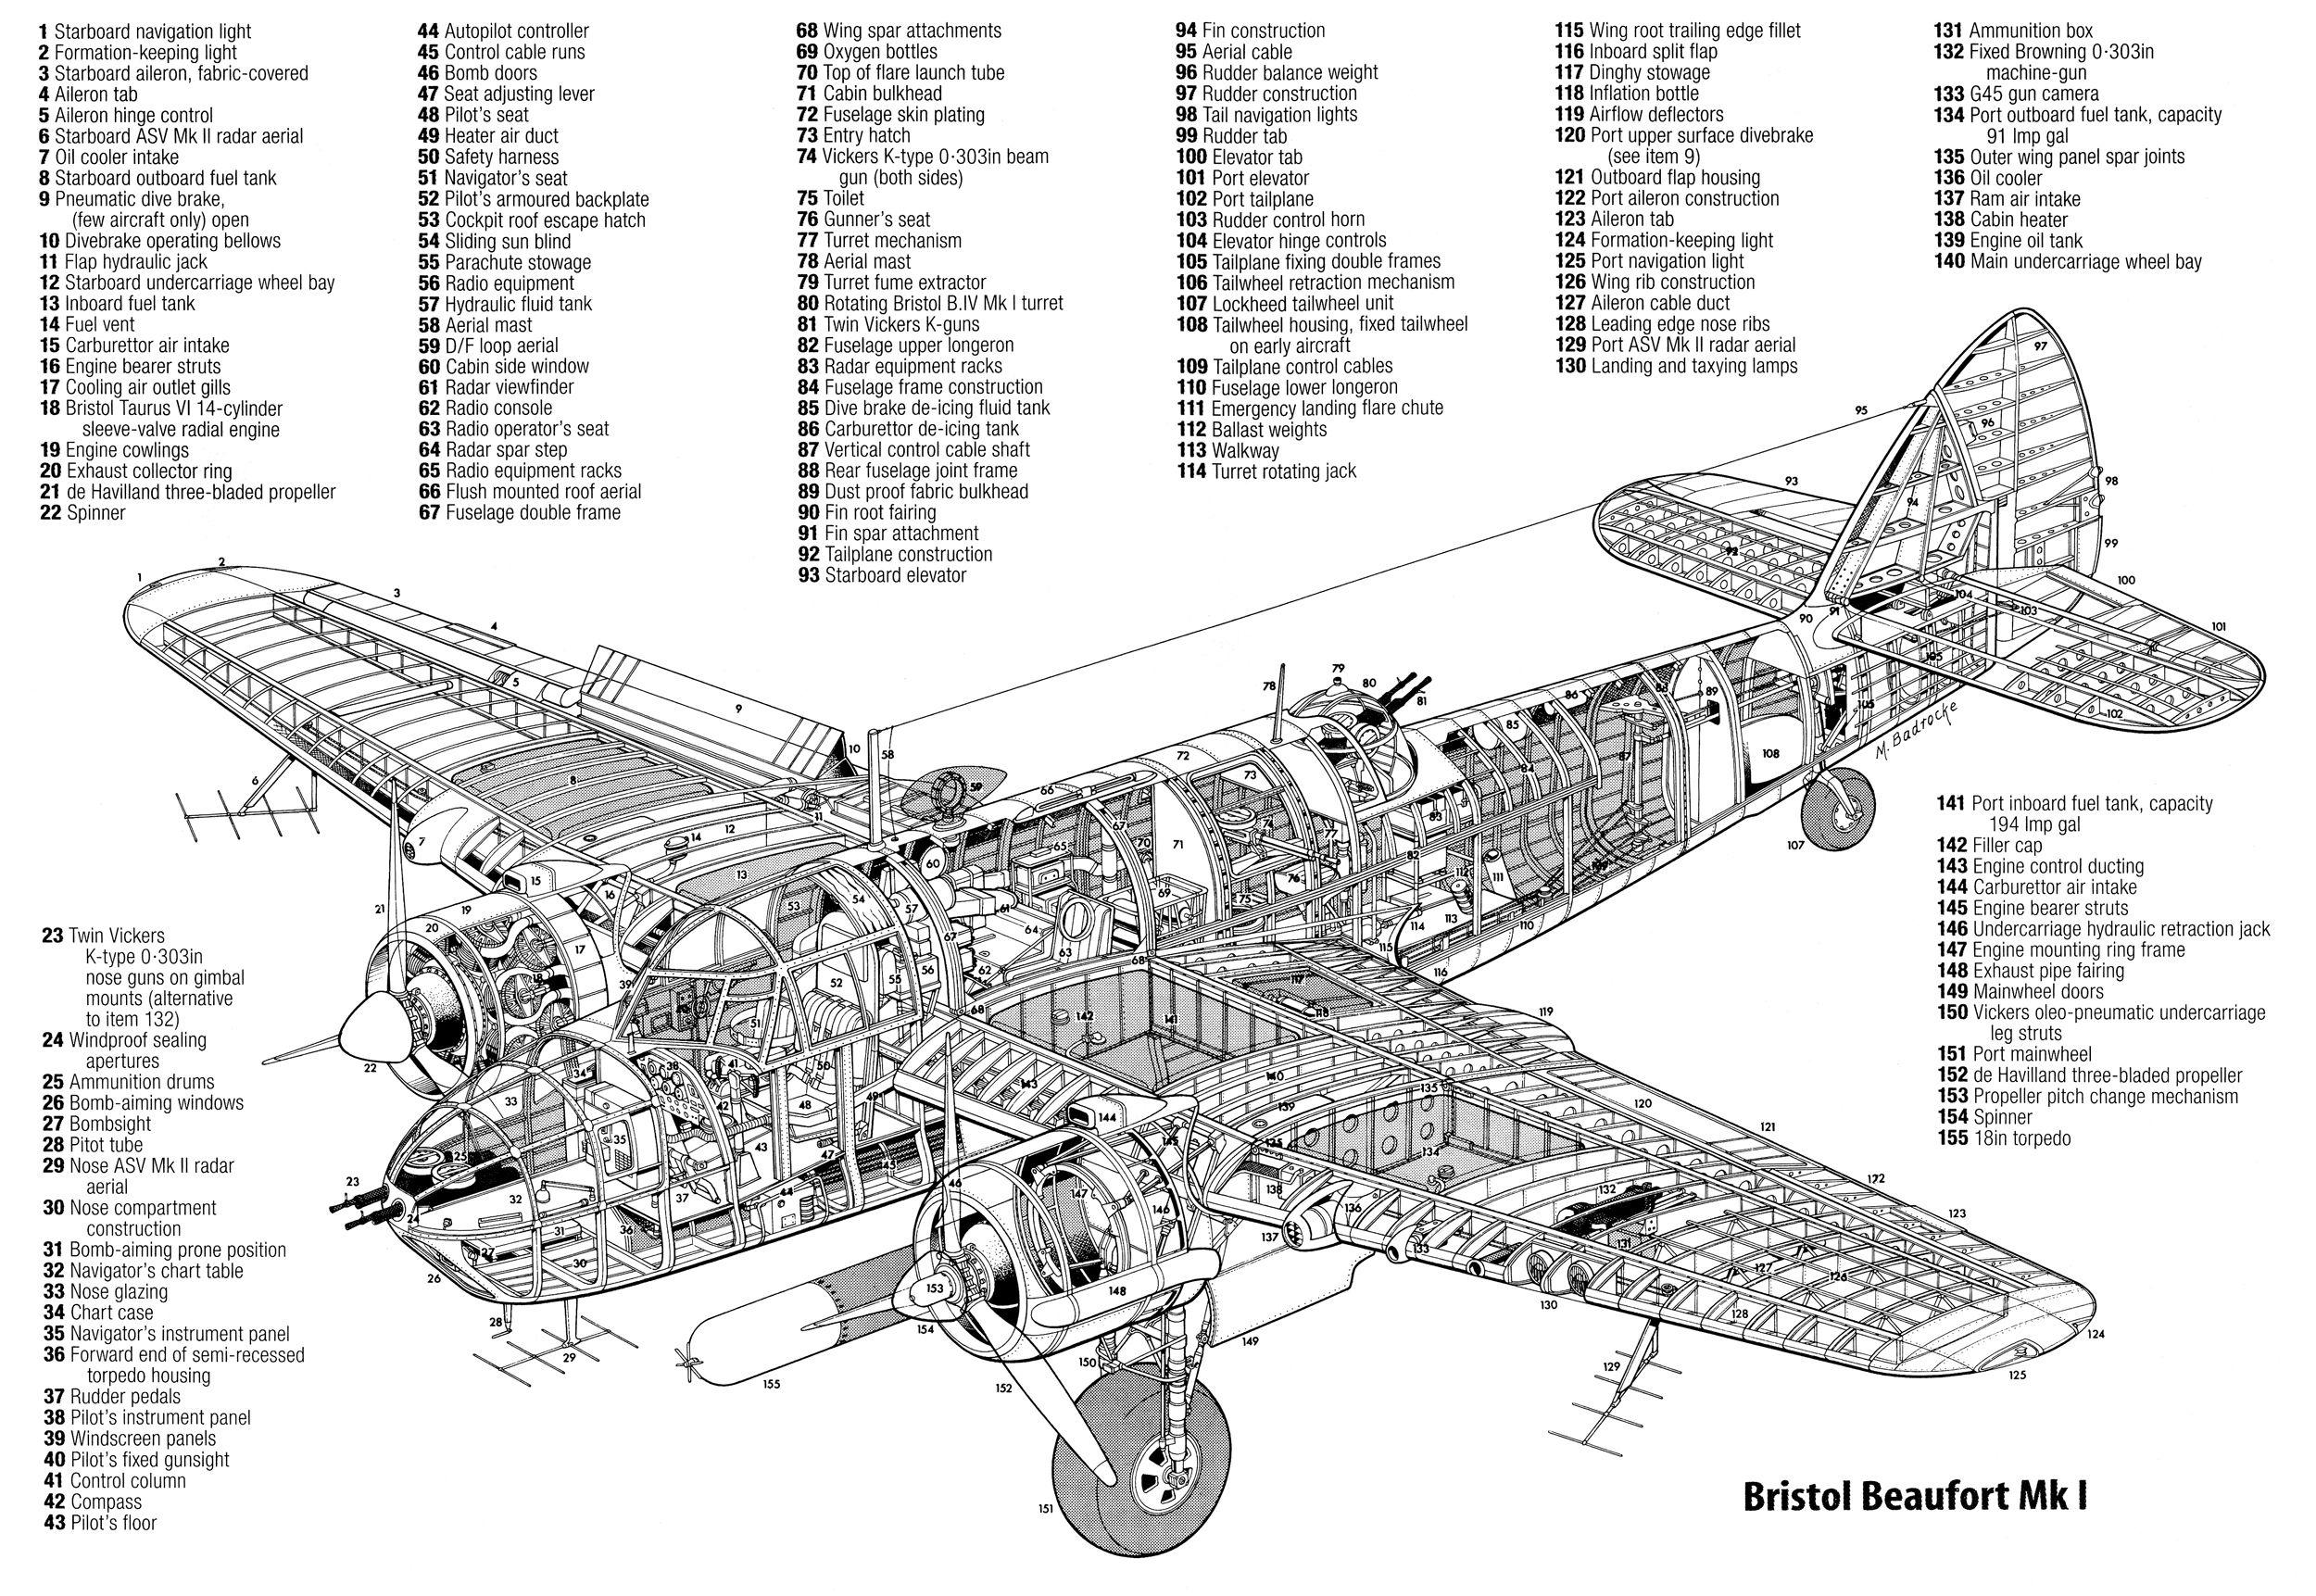 Bristl Beaufort Mk1 Aircraft Cutaway